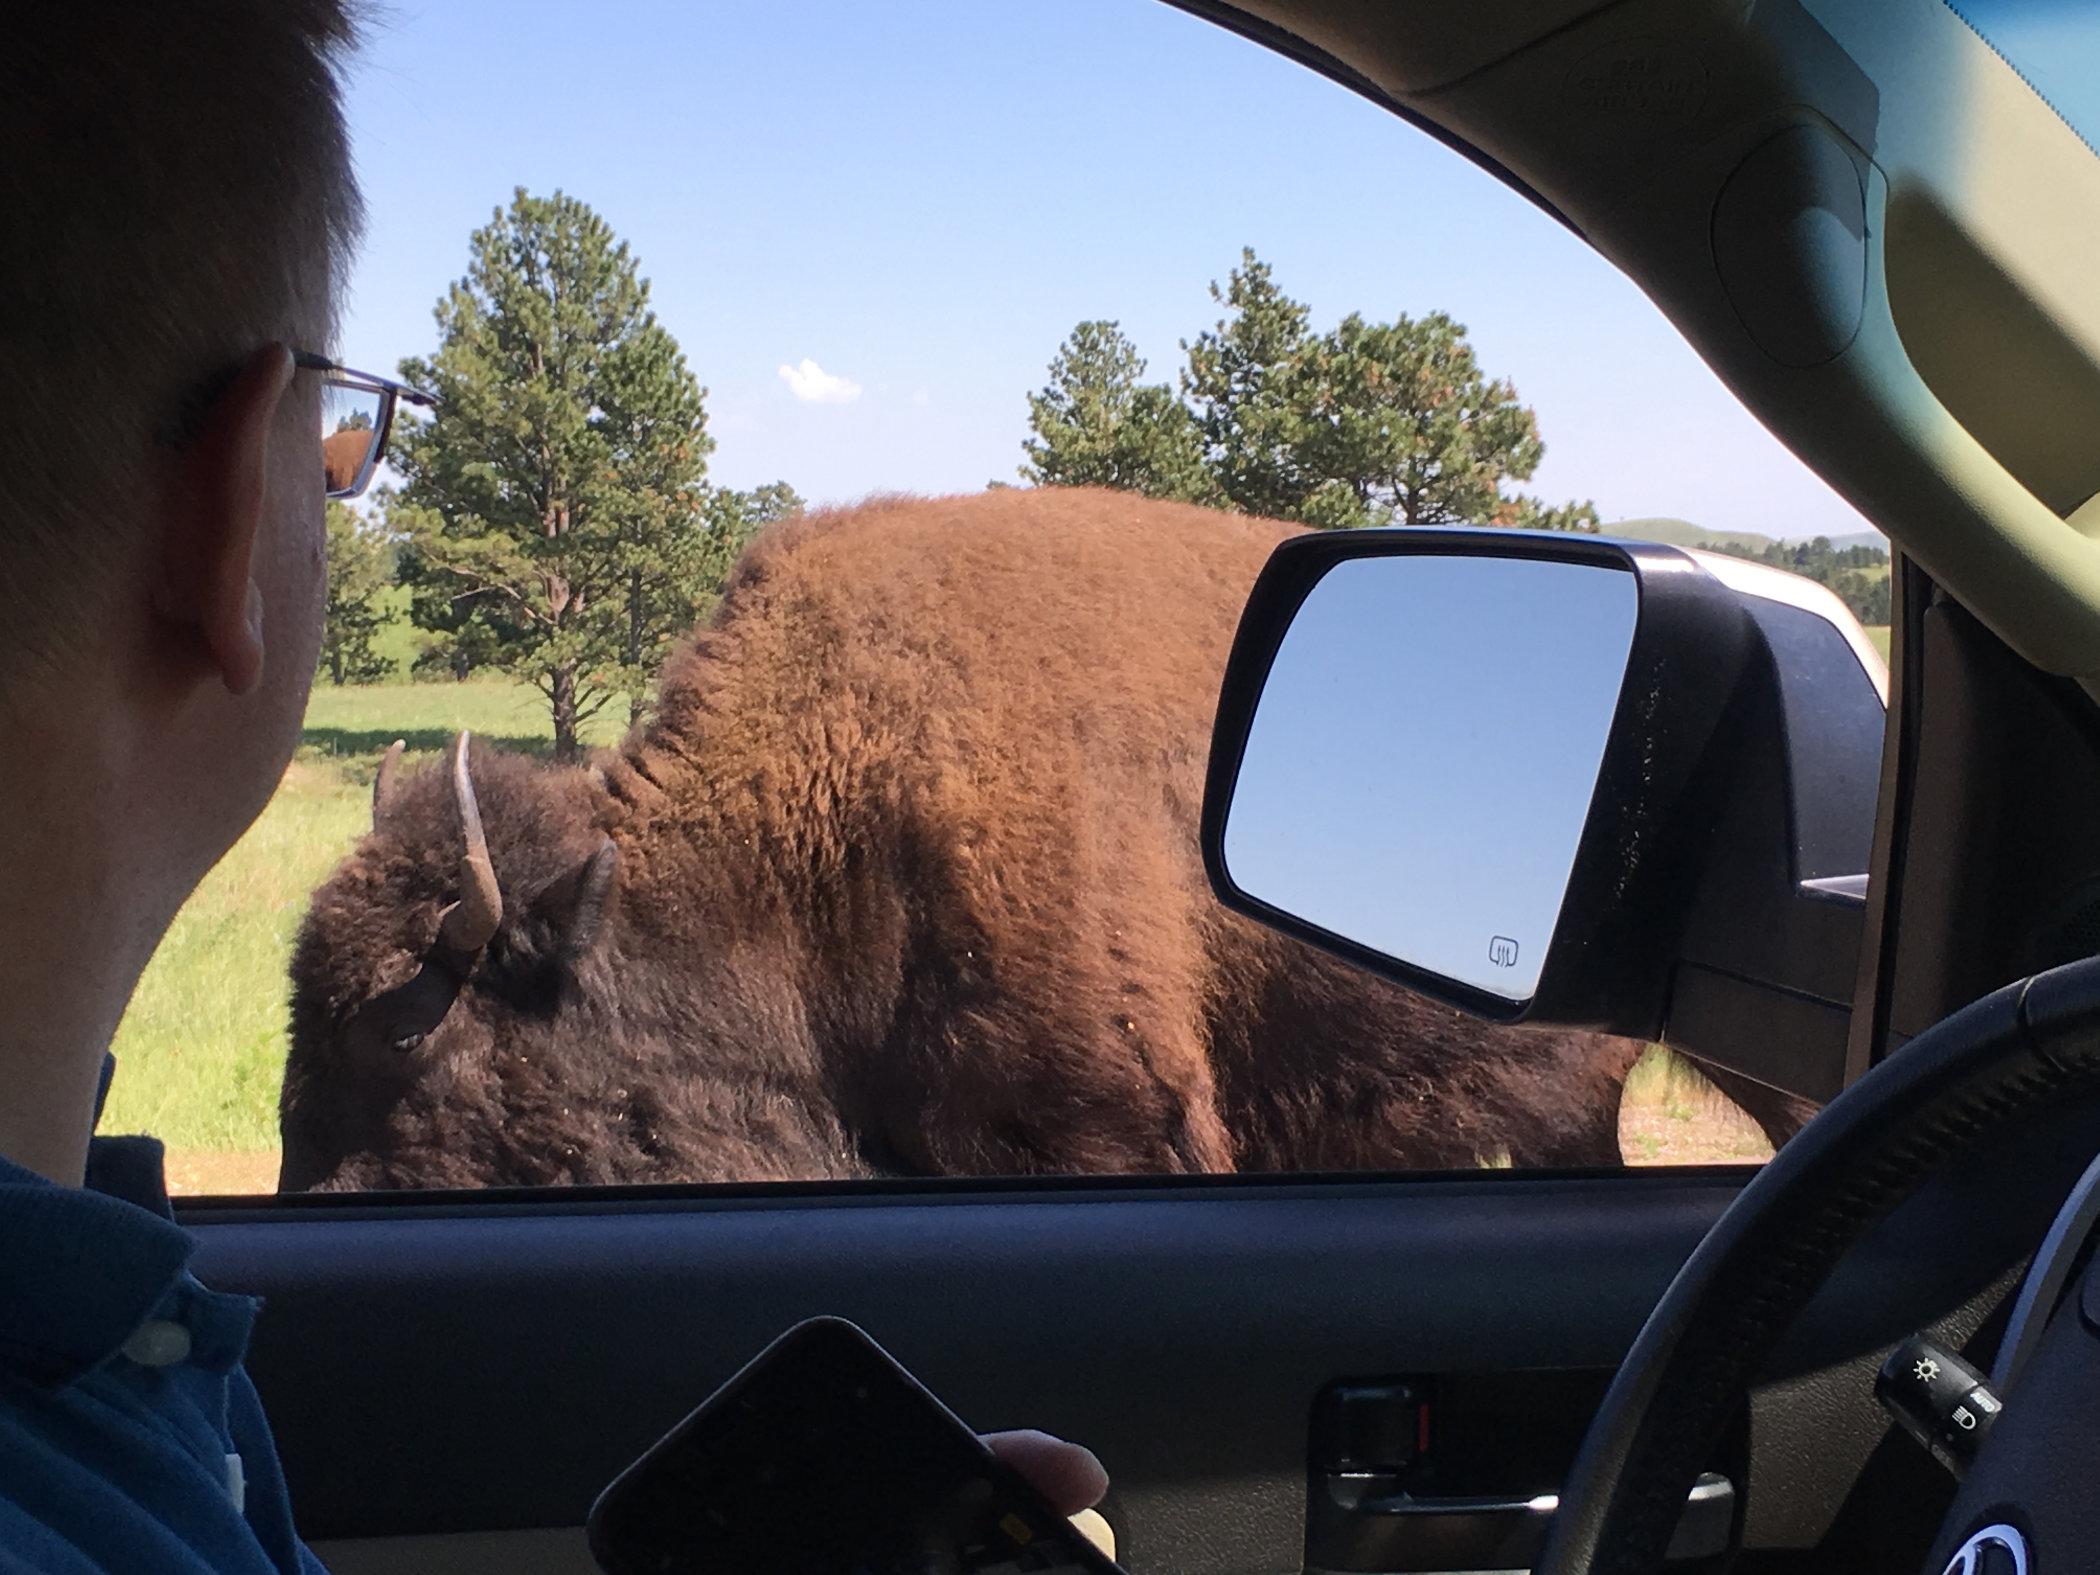 bison-at-car.jpg